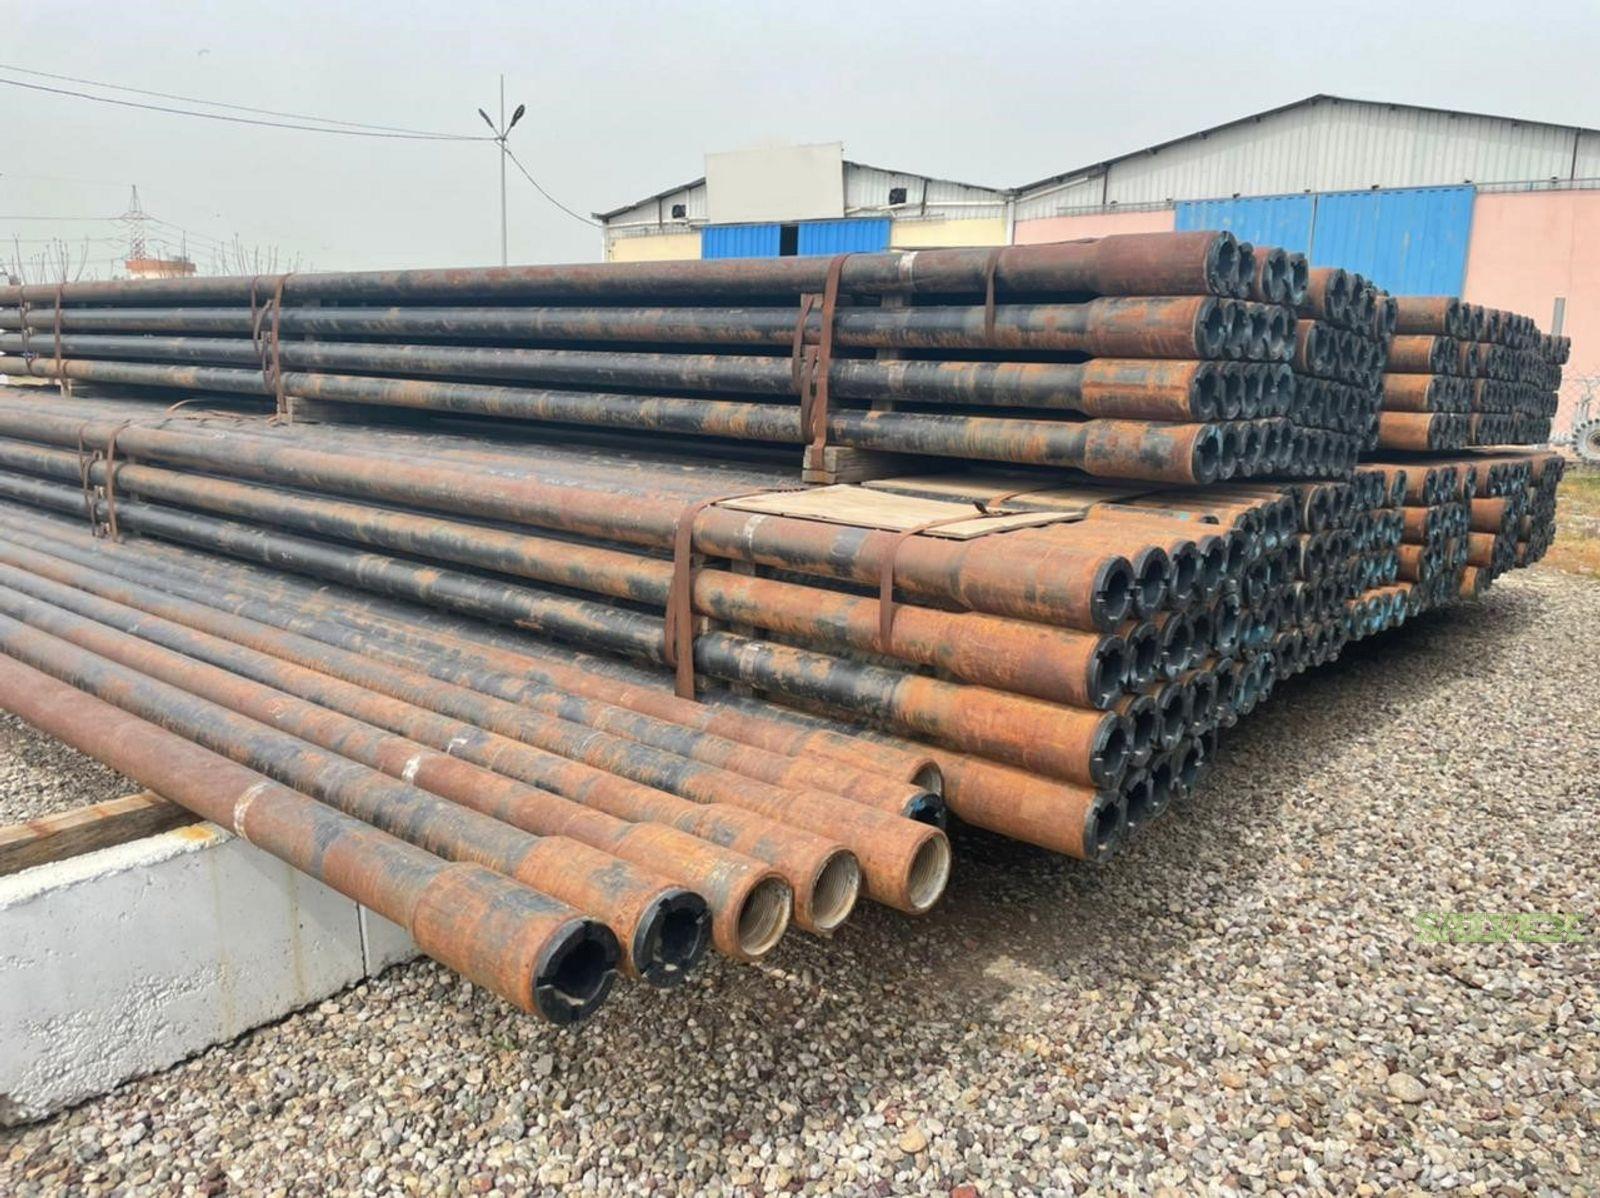 5 19.5# S-135 NC50 Surplus Drill Pipe (10,256 Feet / 105 Metric Tons)